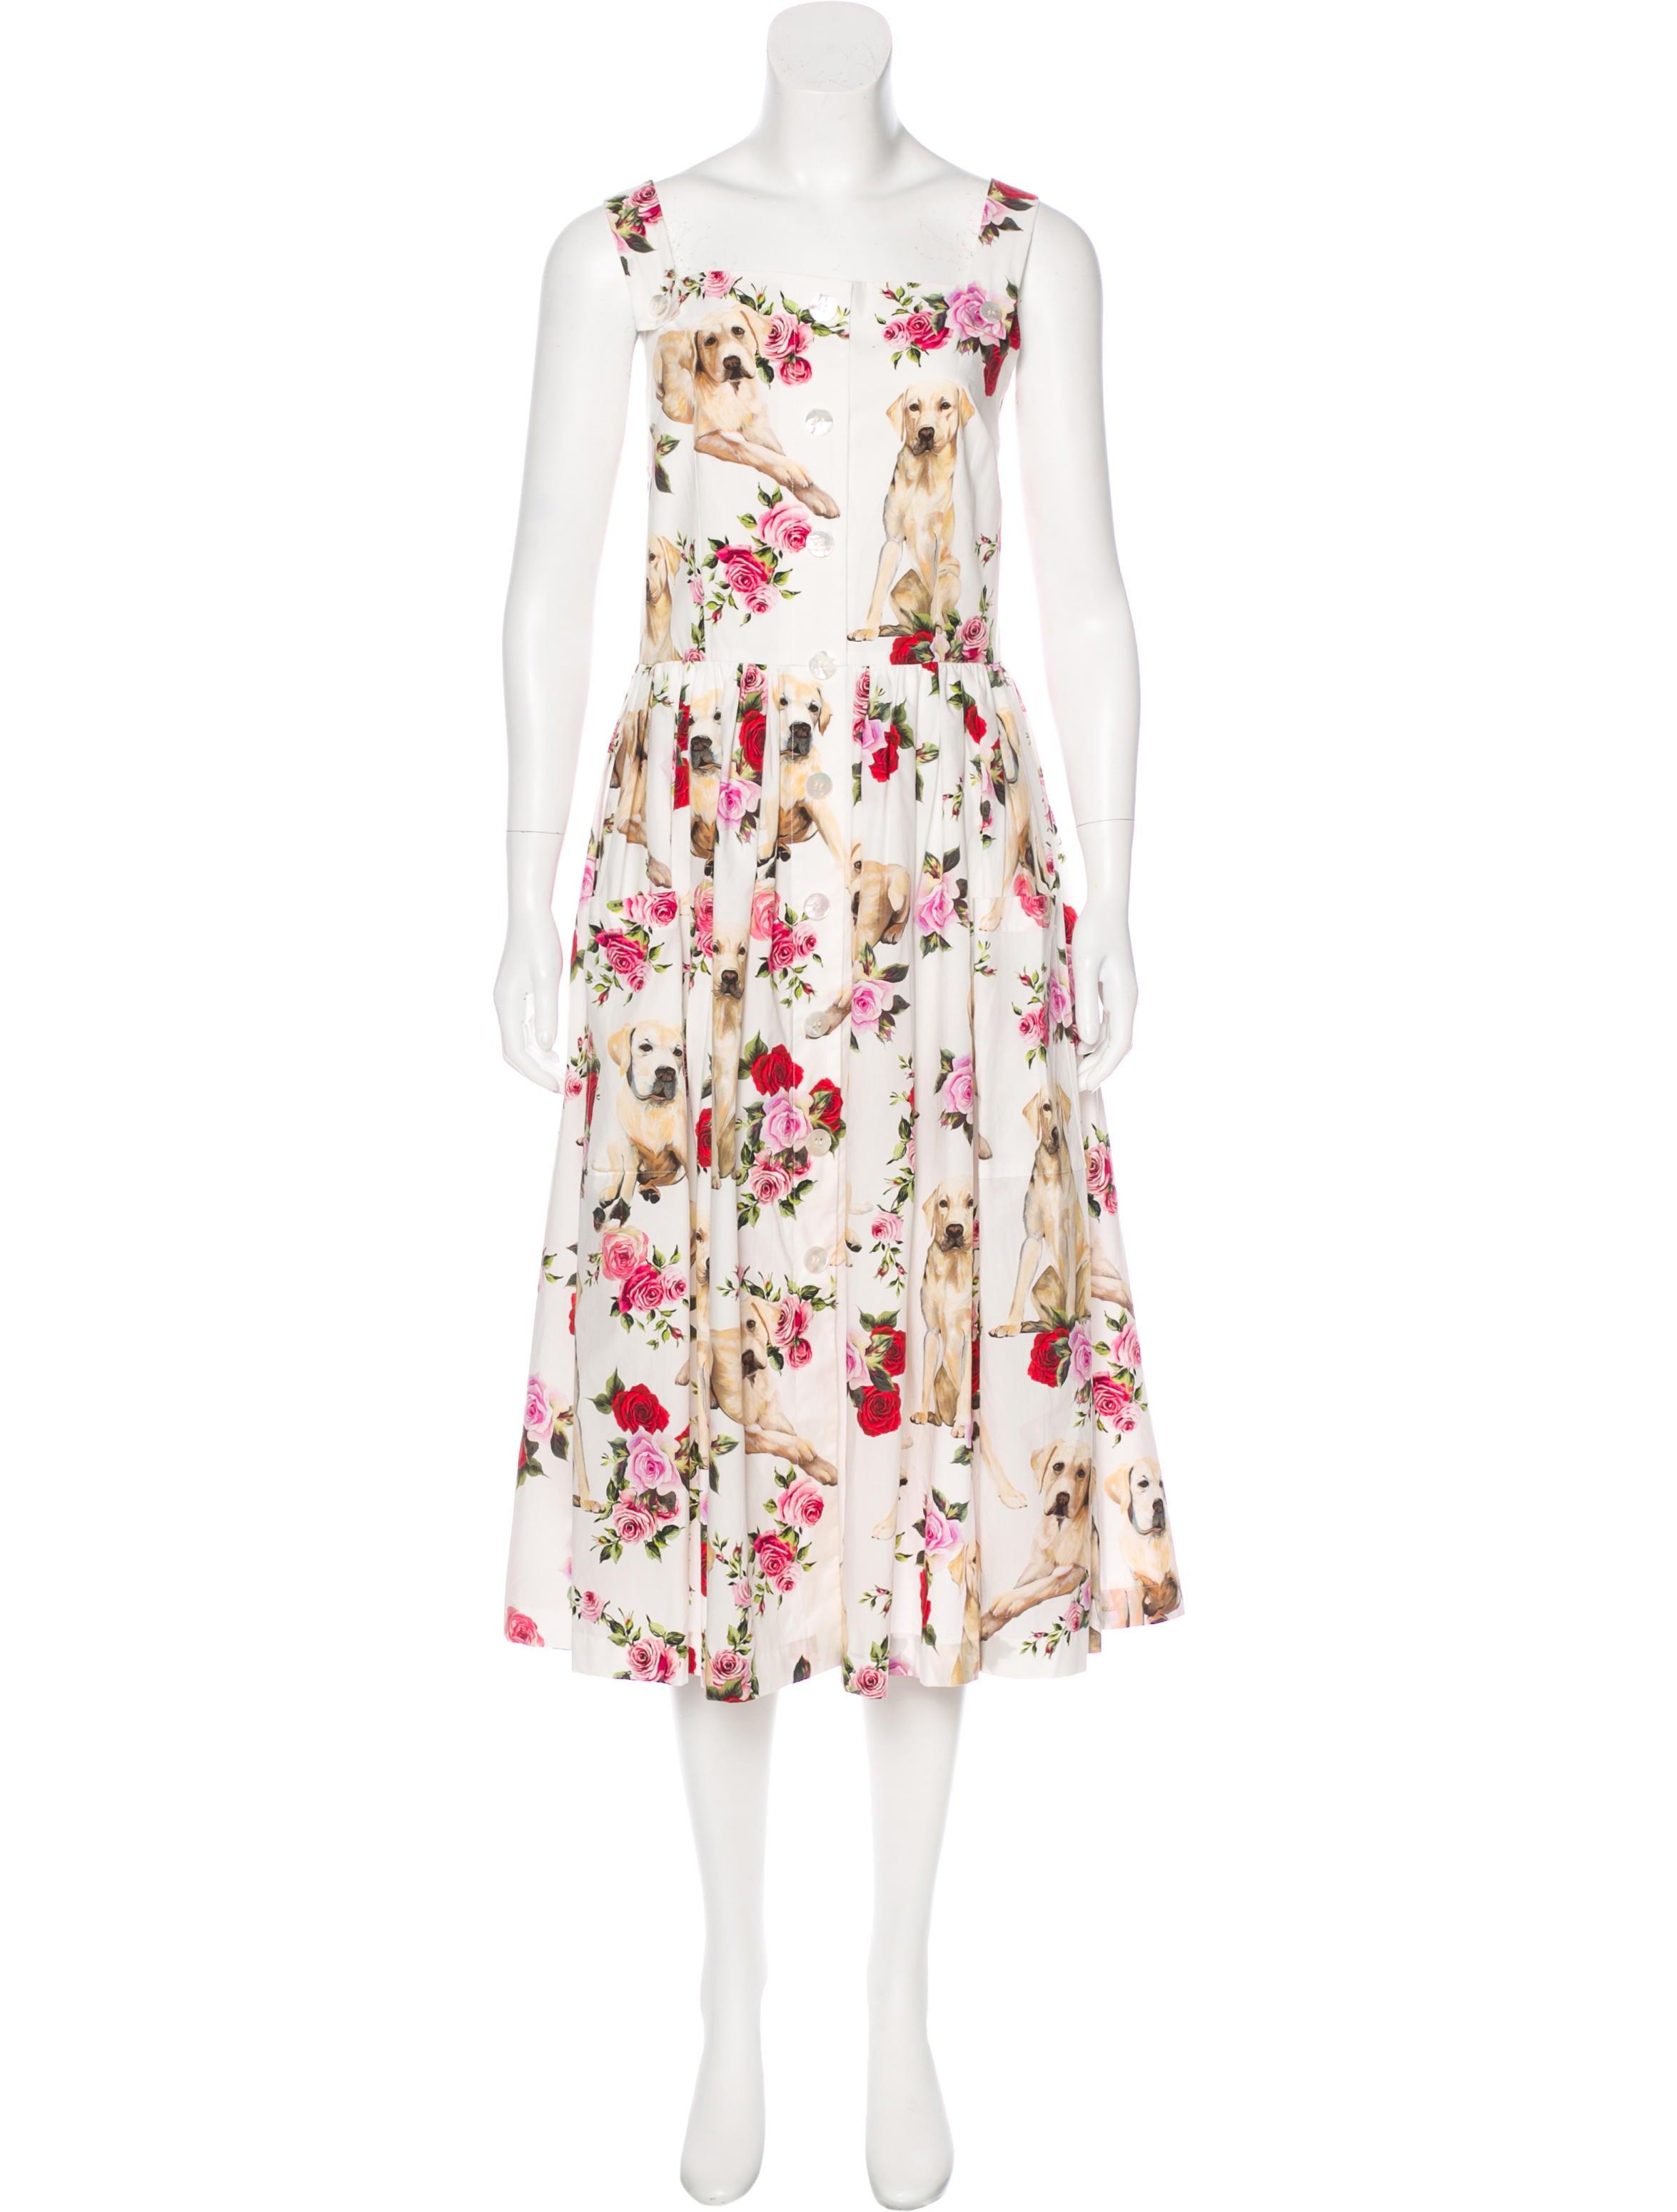 d91643ed Dolce & Gabbana 2017 Labrador Print Dress - Clothing - DAG103018 ...